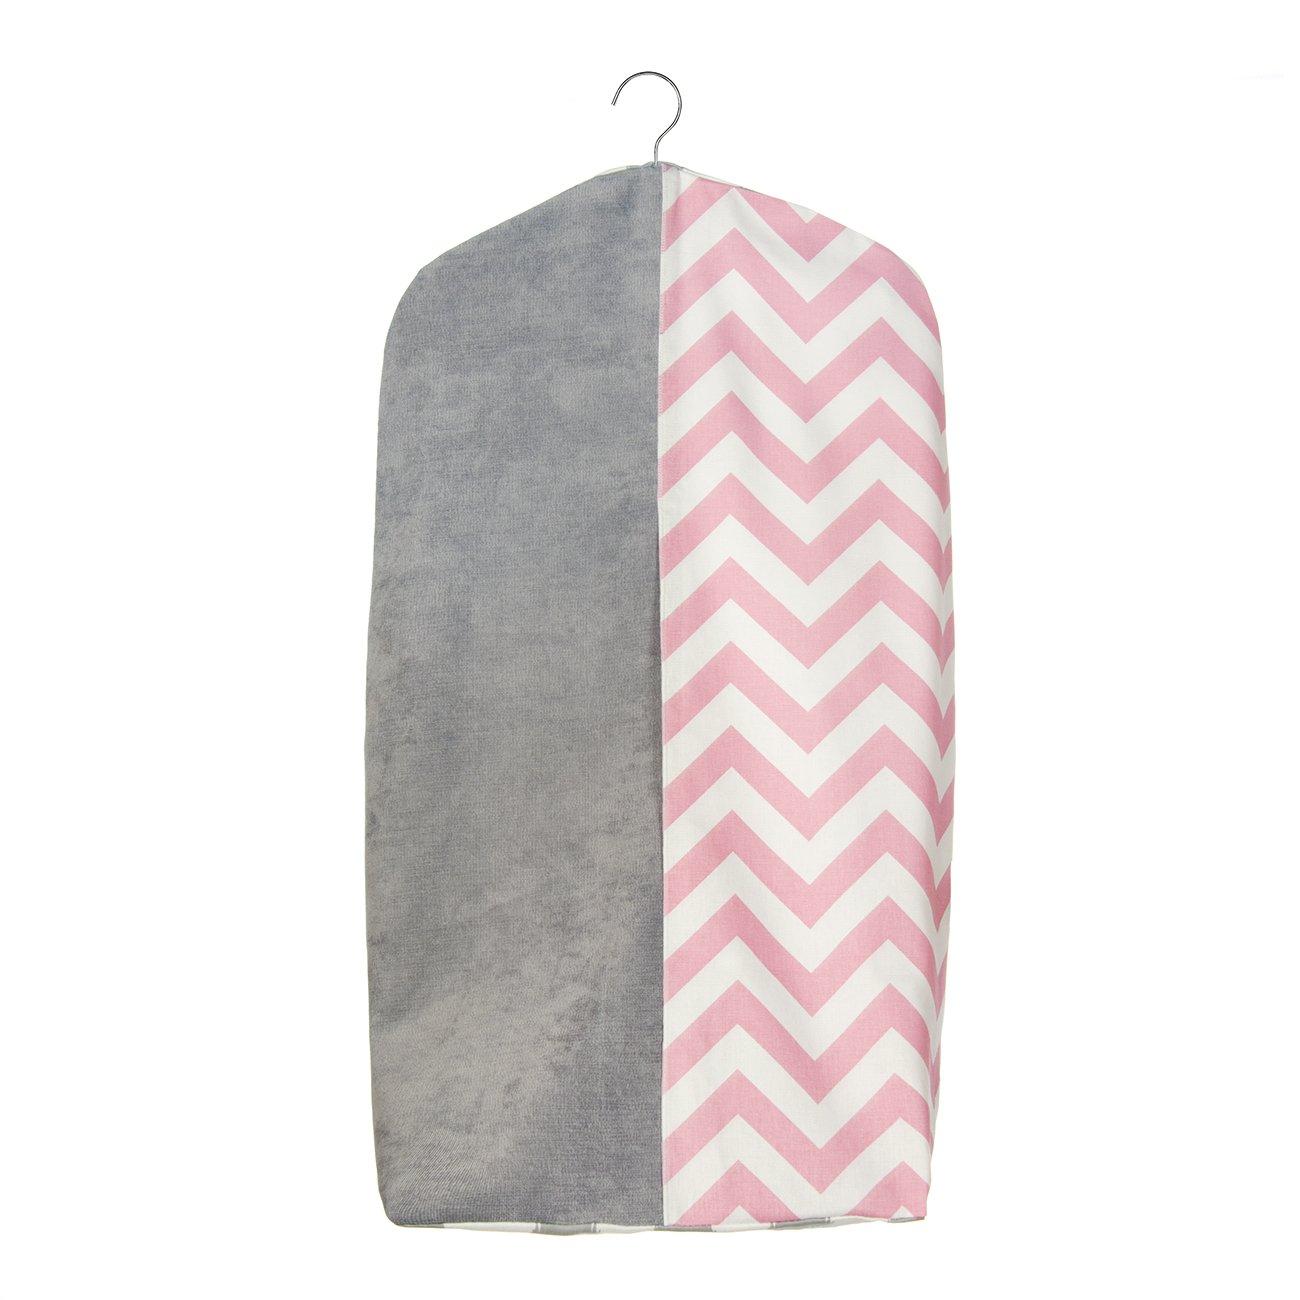 Sweet Potato Swizzle Diaper Stacker, Pink/Grey/White